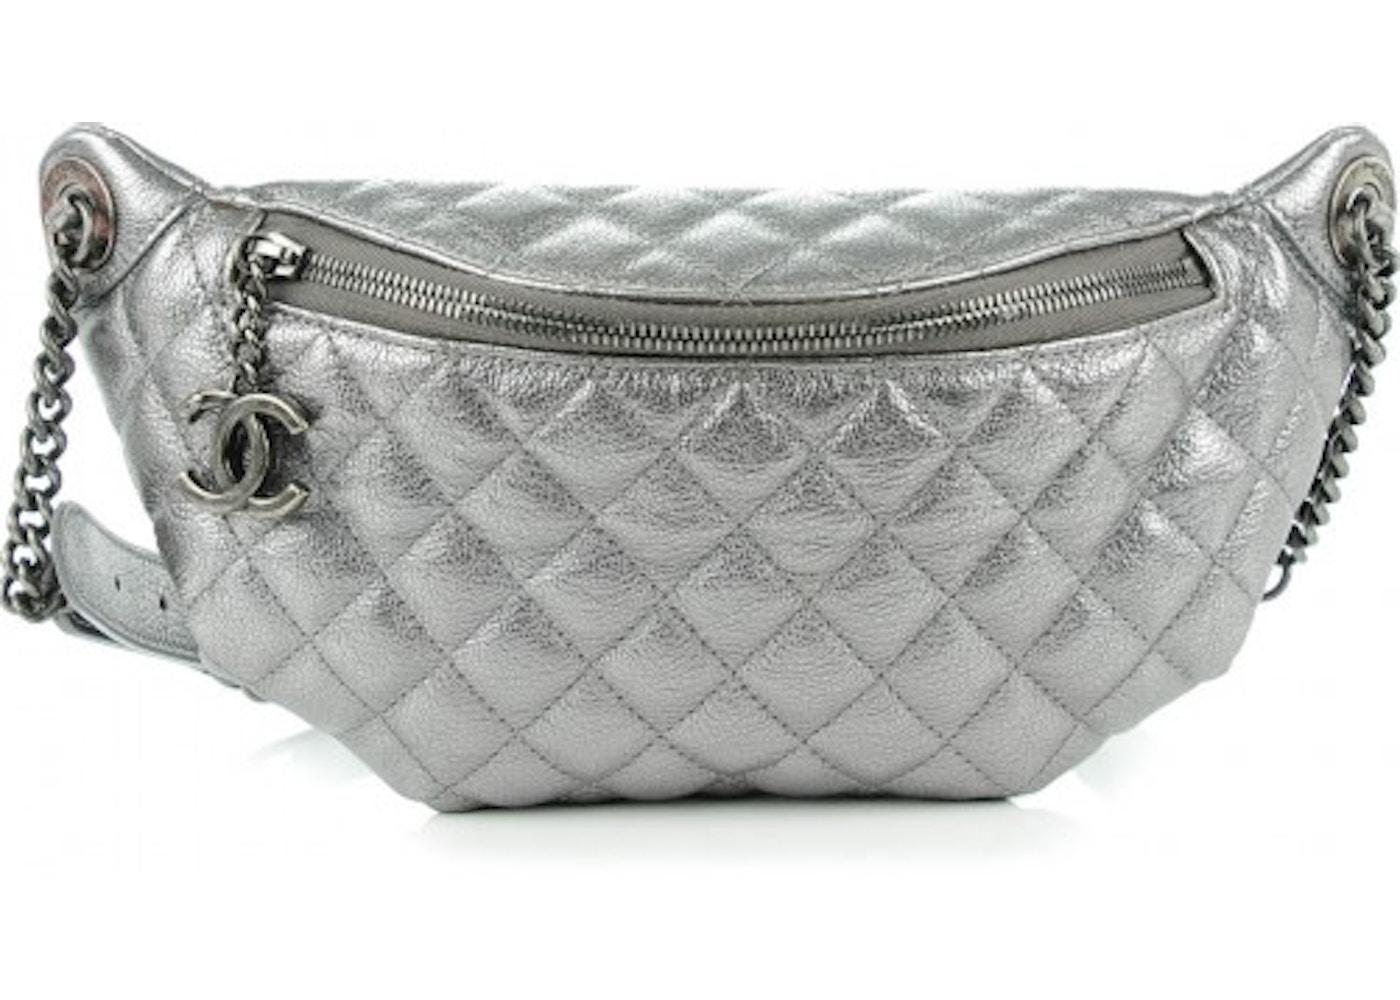 501fb749a49e Chanel Banane Waist Bag Quilted Metallic Silver. Quilted Metallic Silver